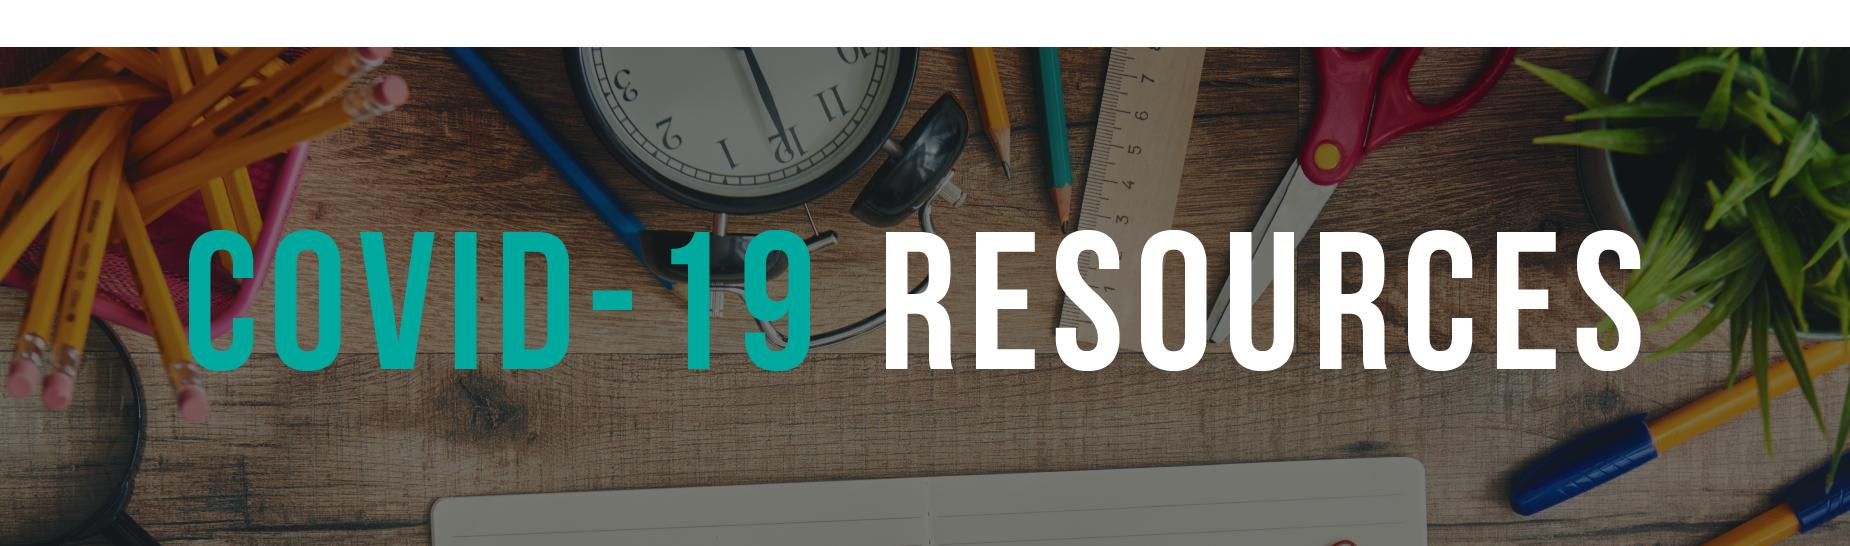 Covid-19 School Resource Banner